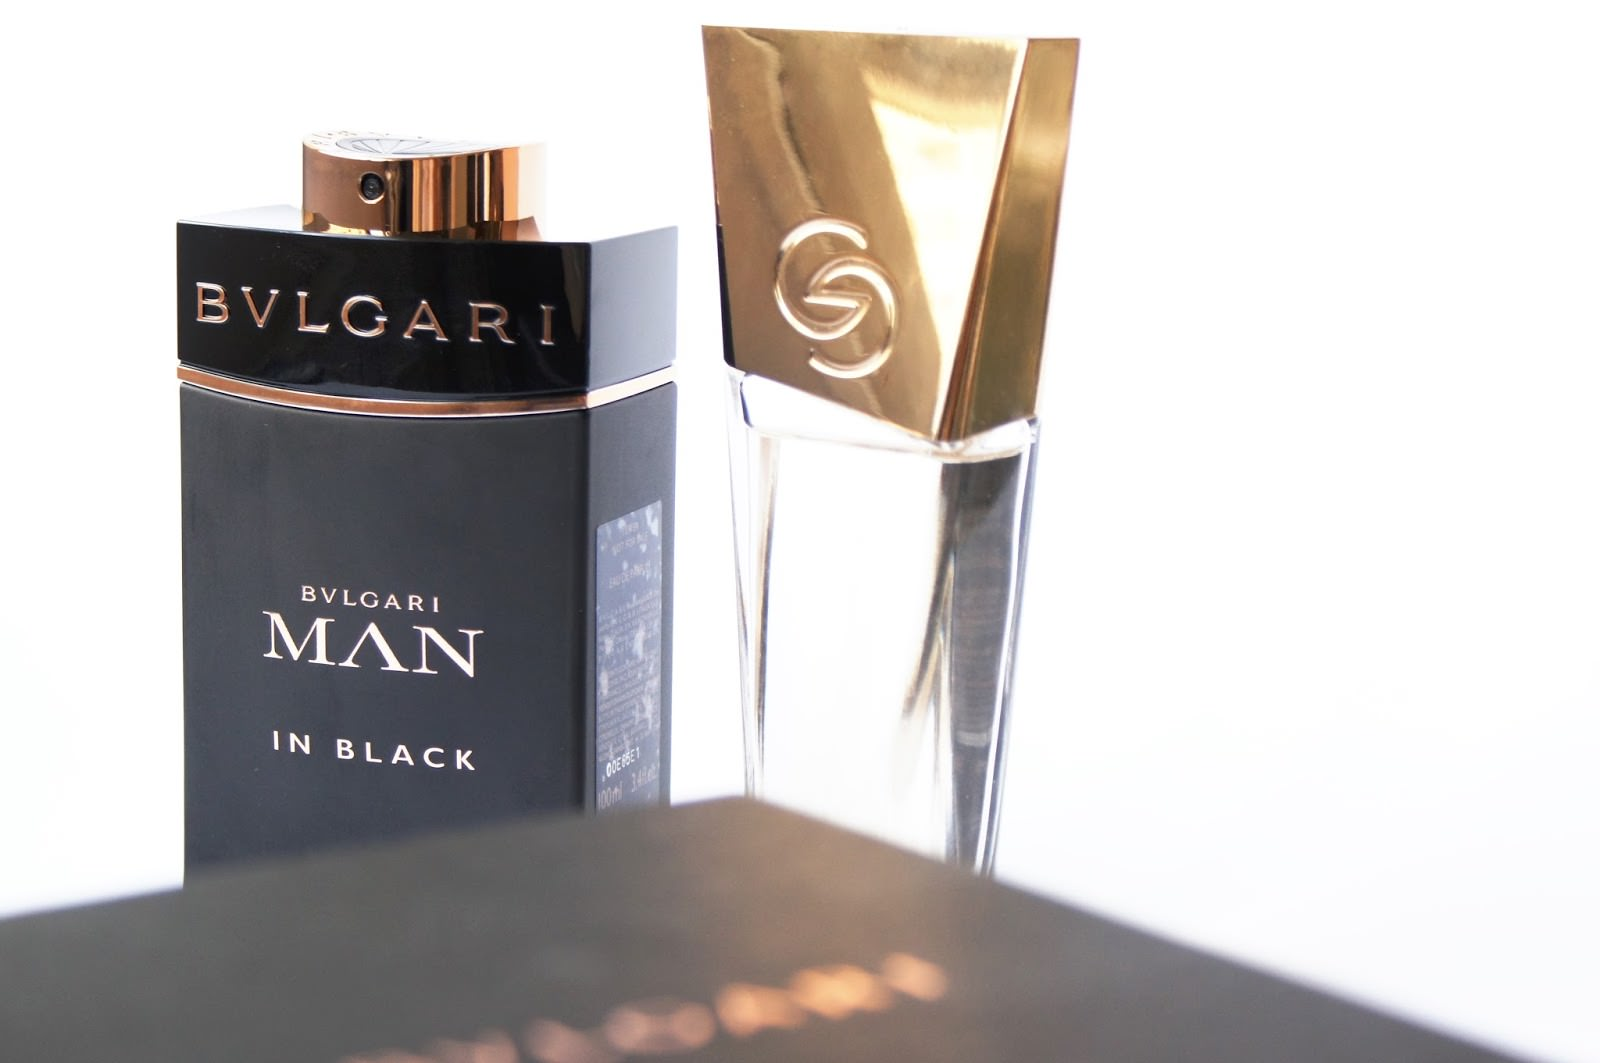 Oriflame Giordani Gold Eau de Parfum, Bvlgari Man in Black Eau de Parfum